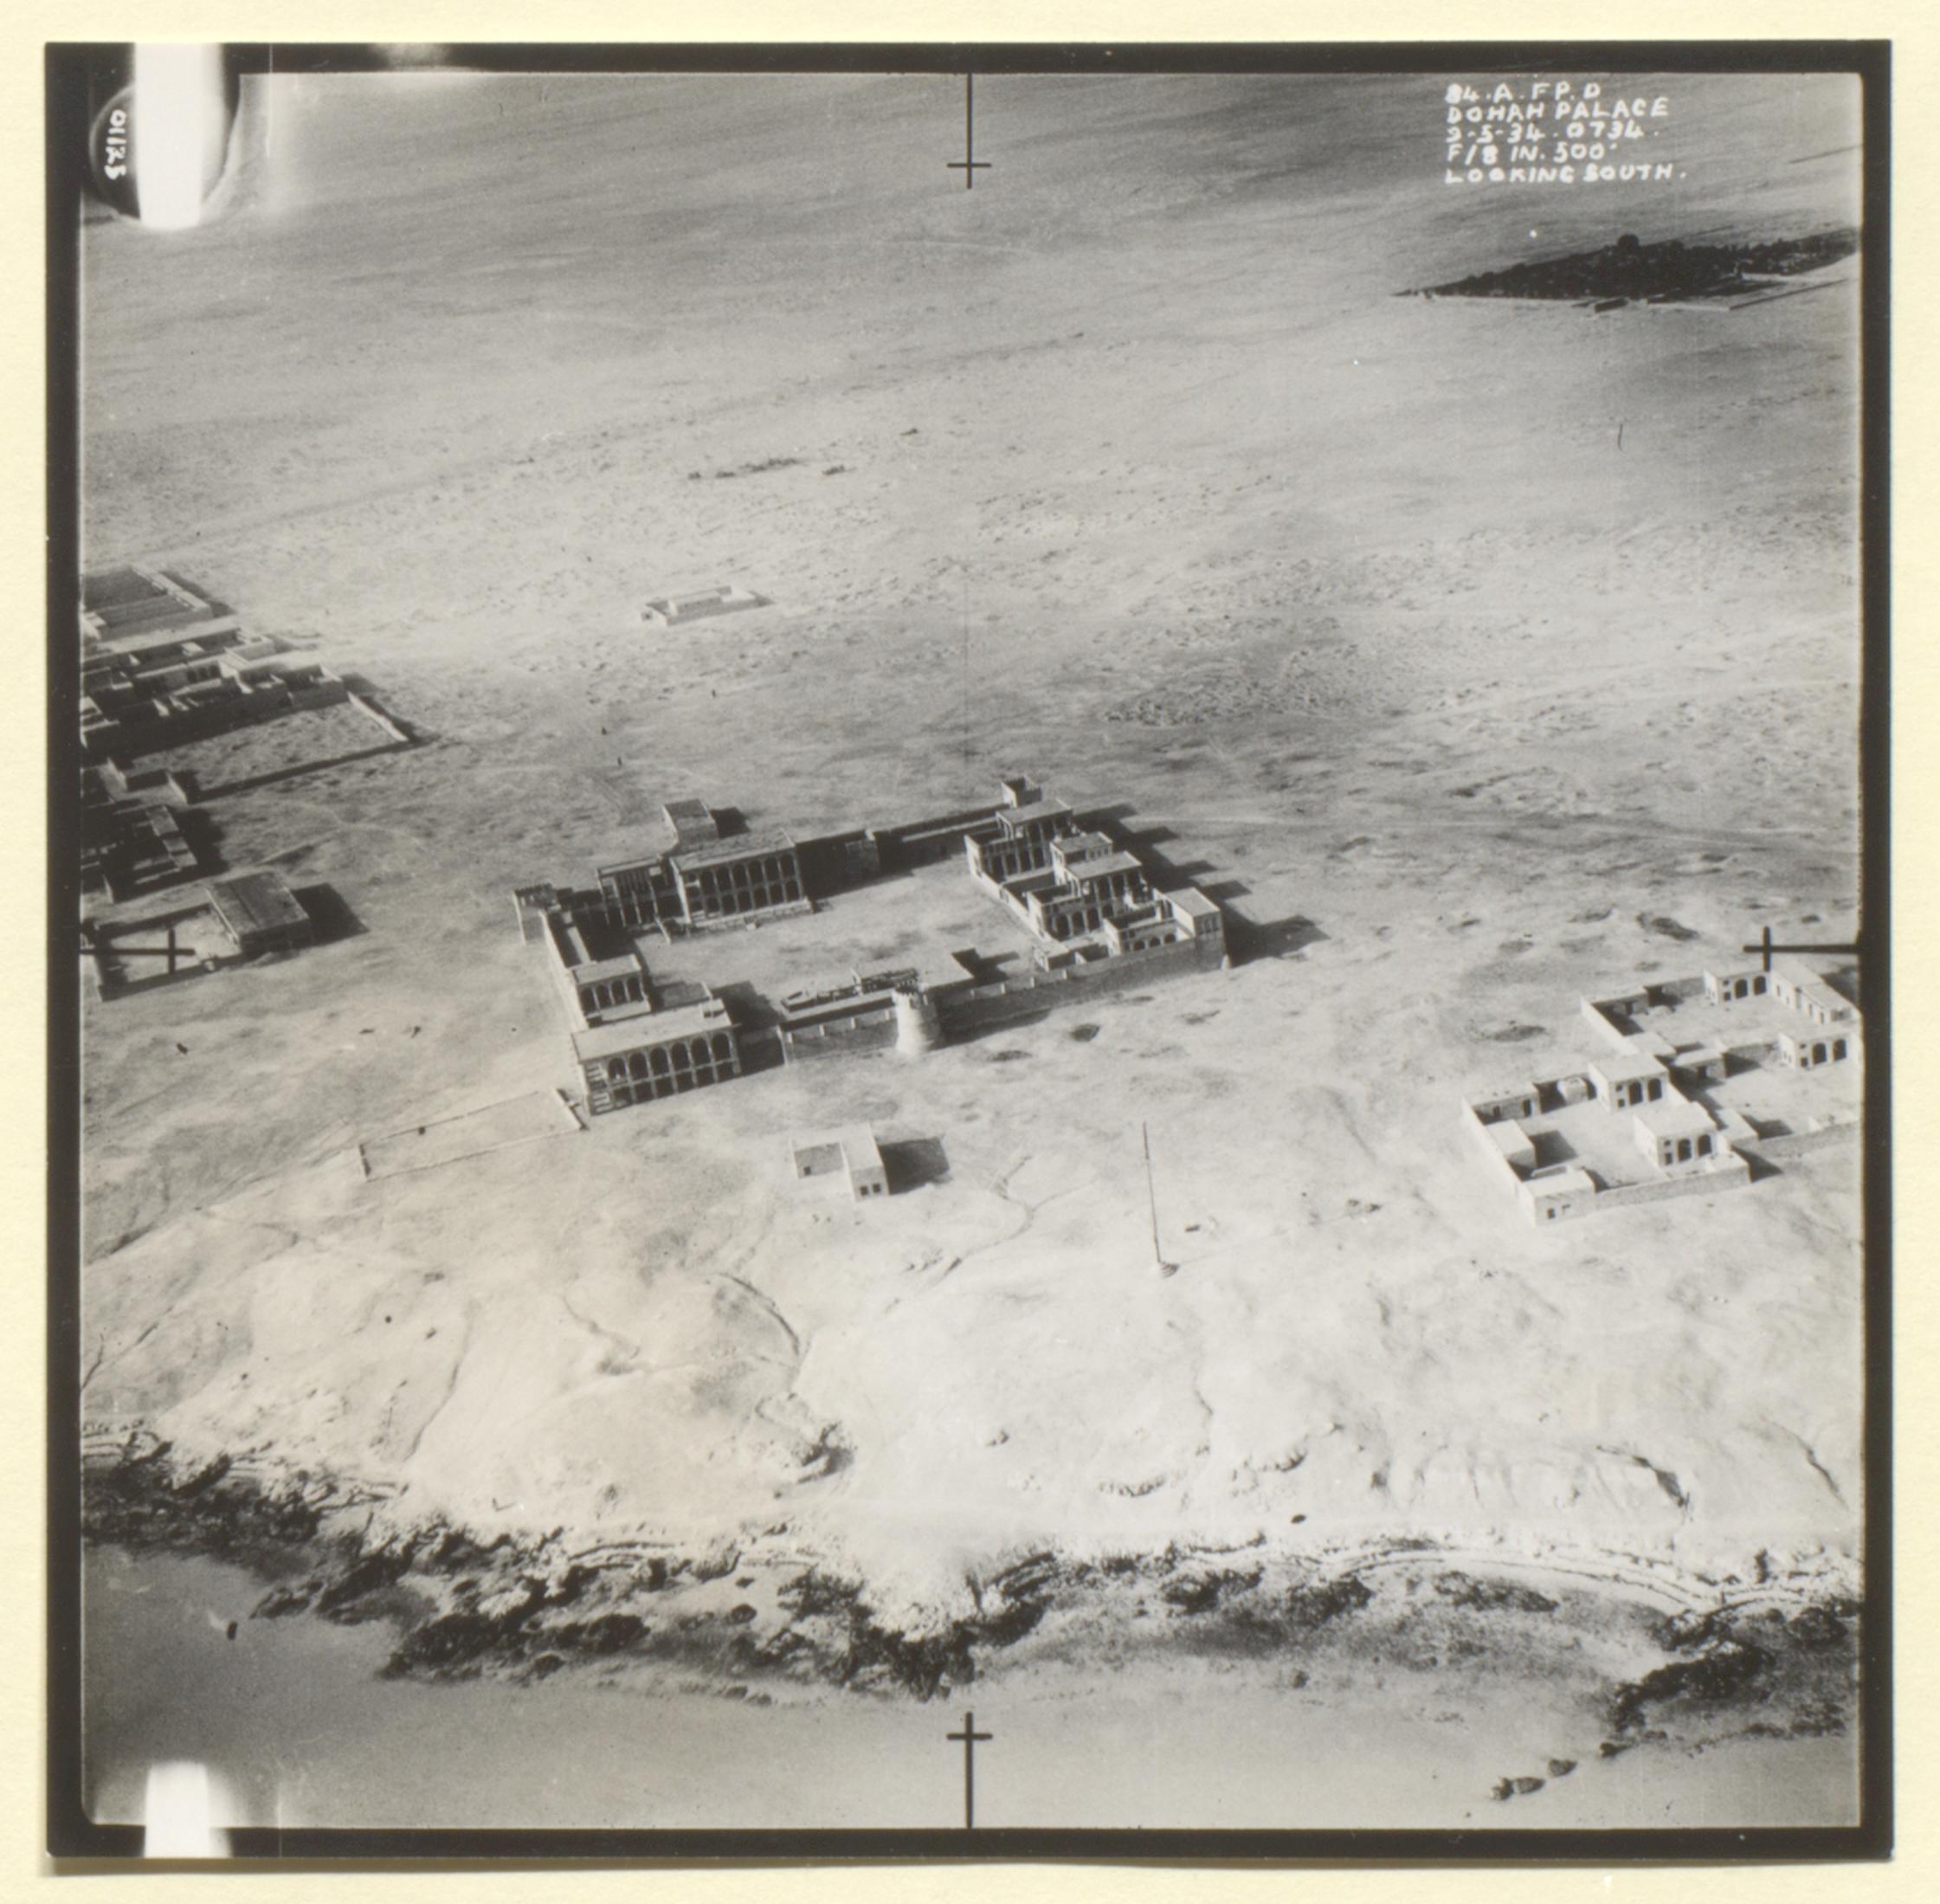 1st Royal Air Force photograph of Doha, Kara-Ana and Raiyan from a the file 'Air-route to India: Arab coast route; emergency landing ground at Qatar' (1934) (IOR/L/PS/12/1956)